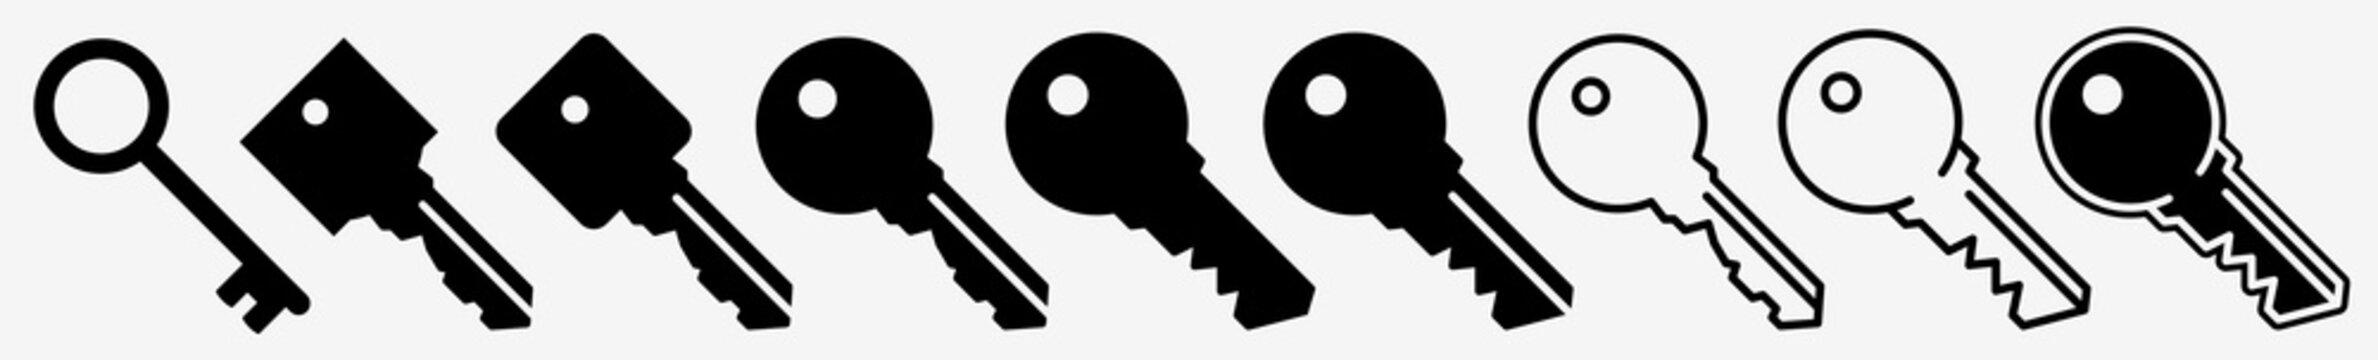 Key Icon House Key Lock Set   Keys Icon Unlock Vector Illustration Logo   Door Key Access Key Icon Isolated Collection